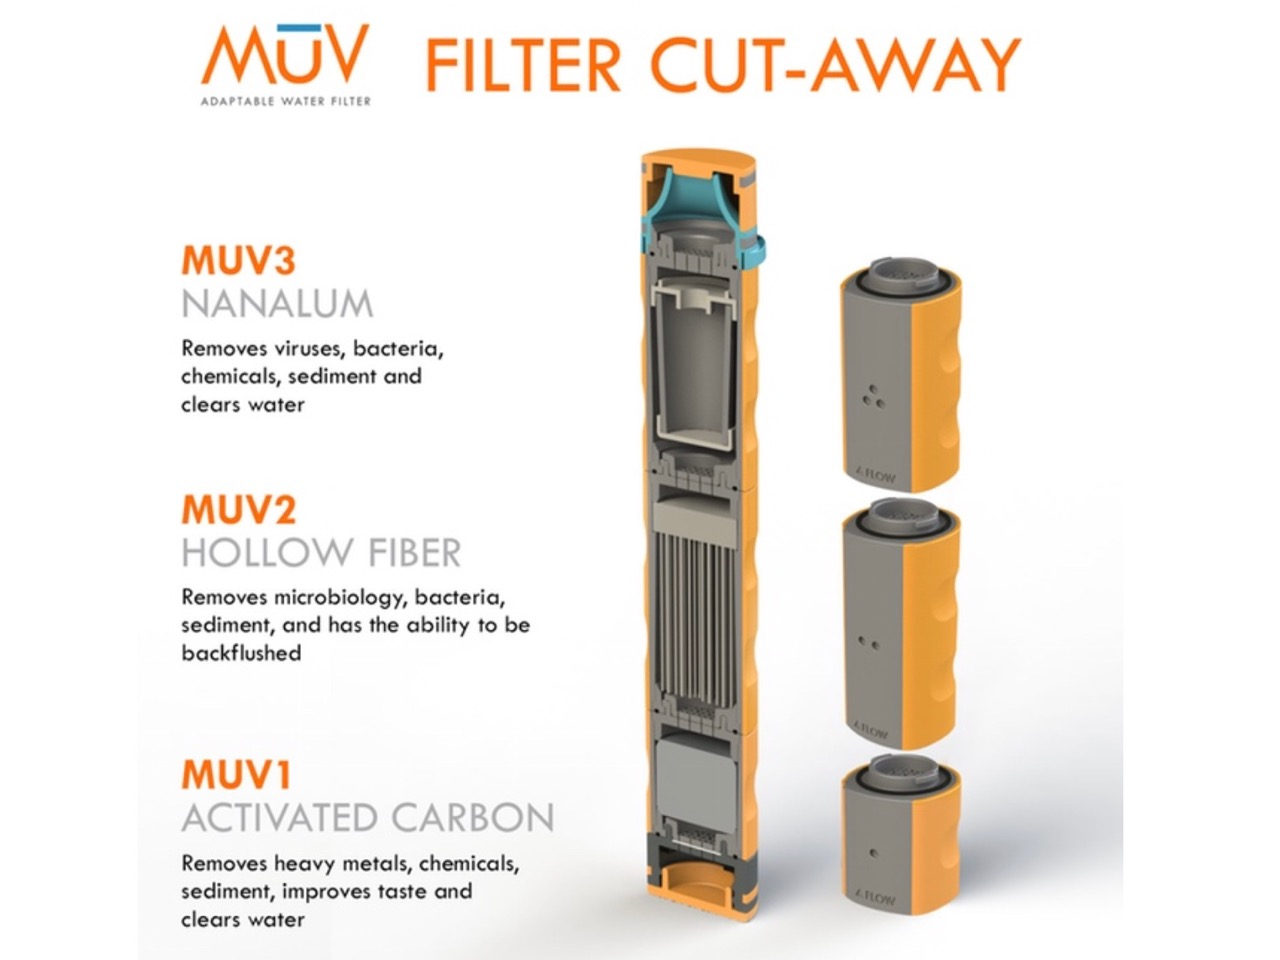 muv - 2